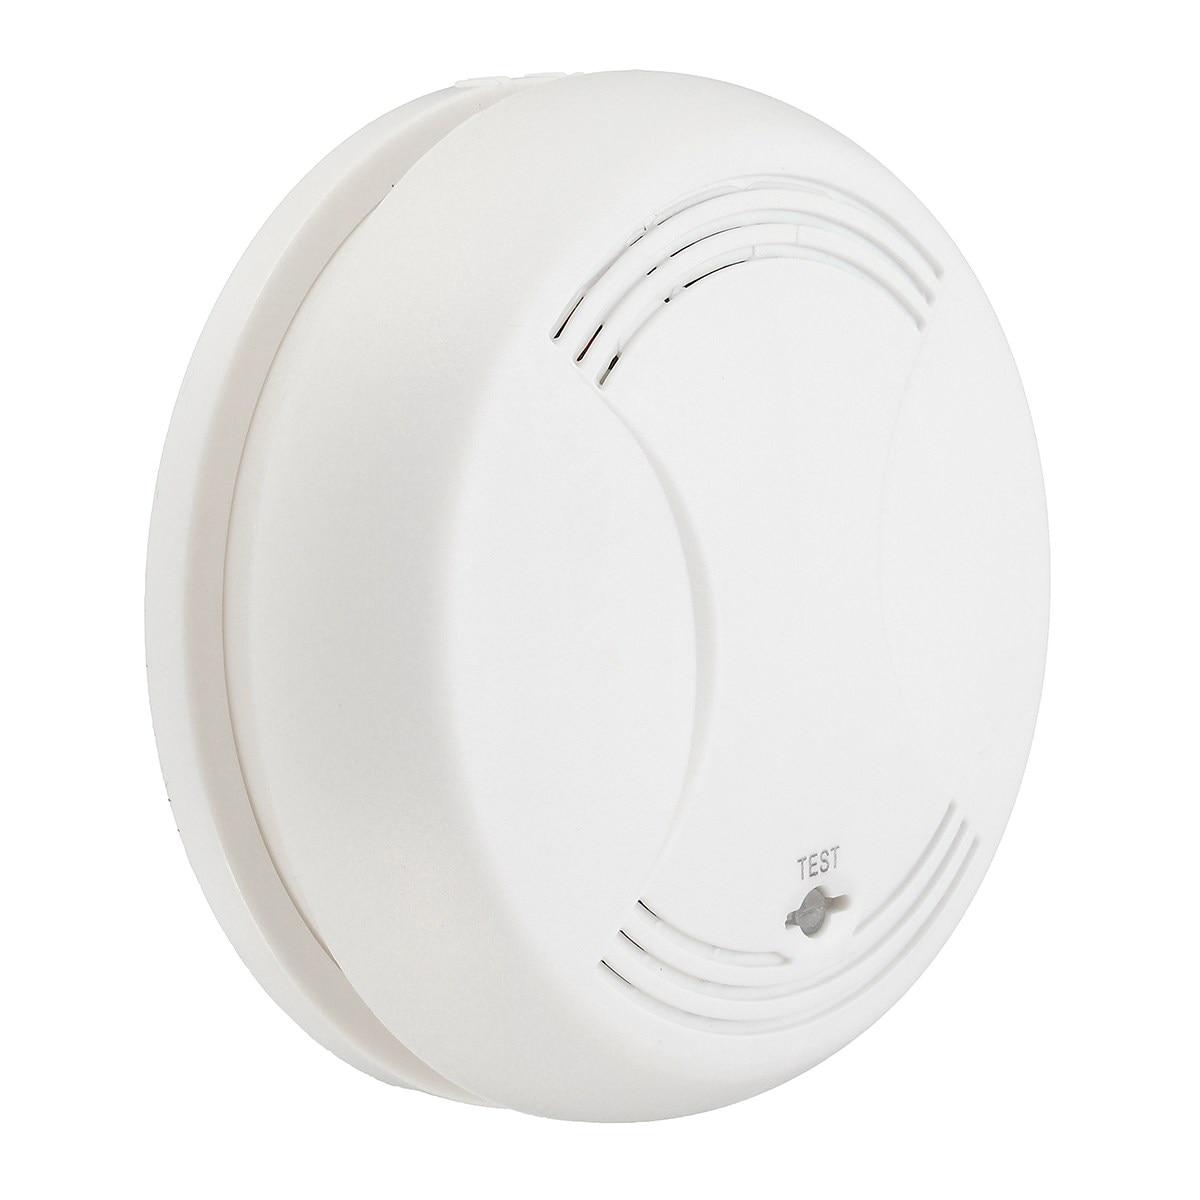 NEW Carbon Monoxide Poisoning Smoke Gas Sensor Warning Alarm Detector Tester Home Security High Sensitive smoke alarm gas detector audio sound high fidelity sensitive monitor microphone